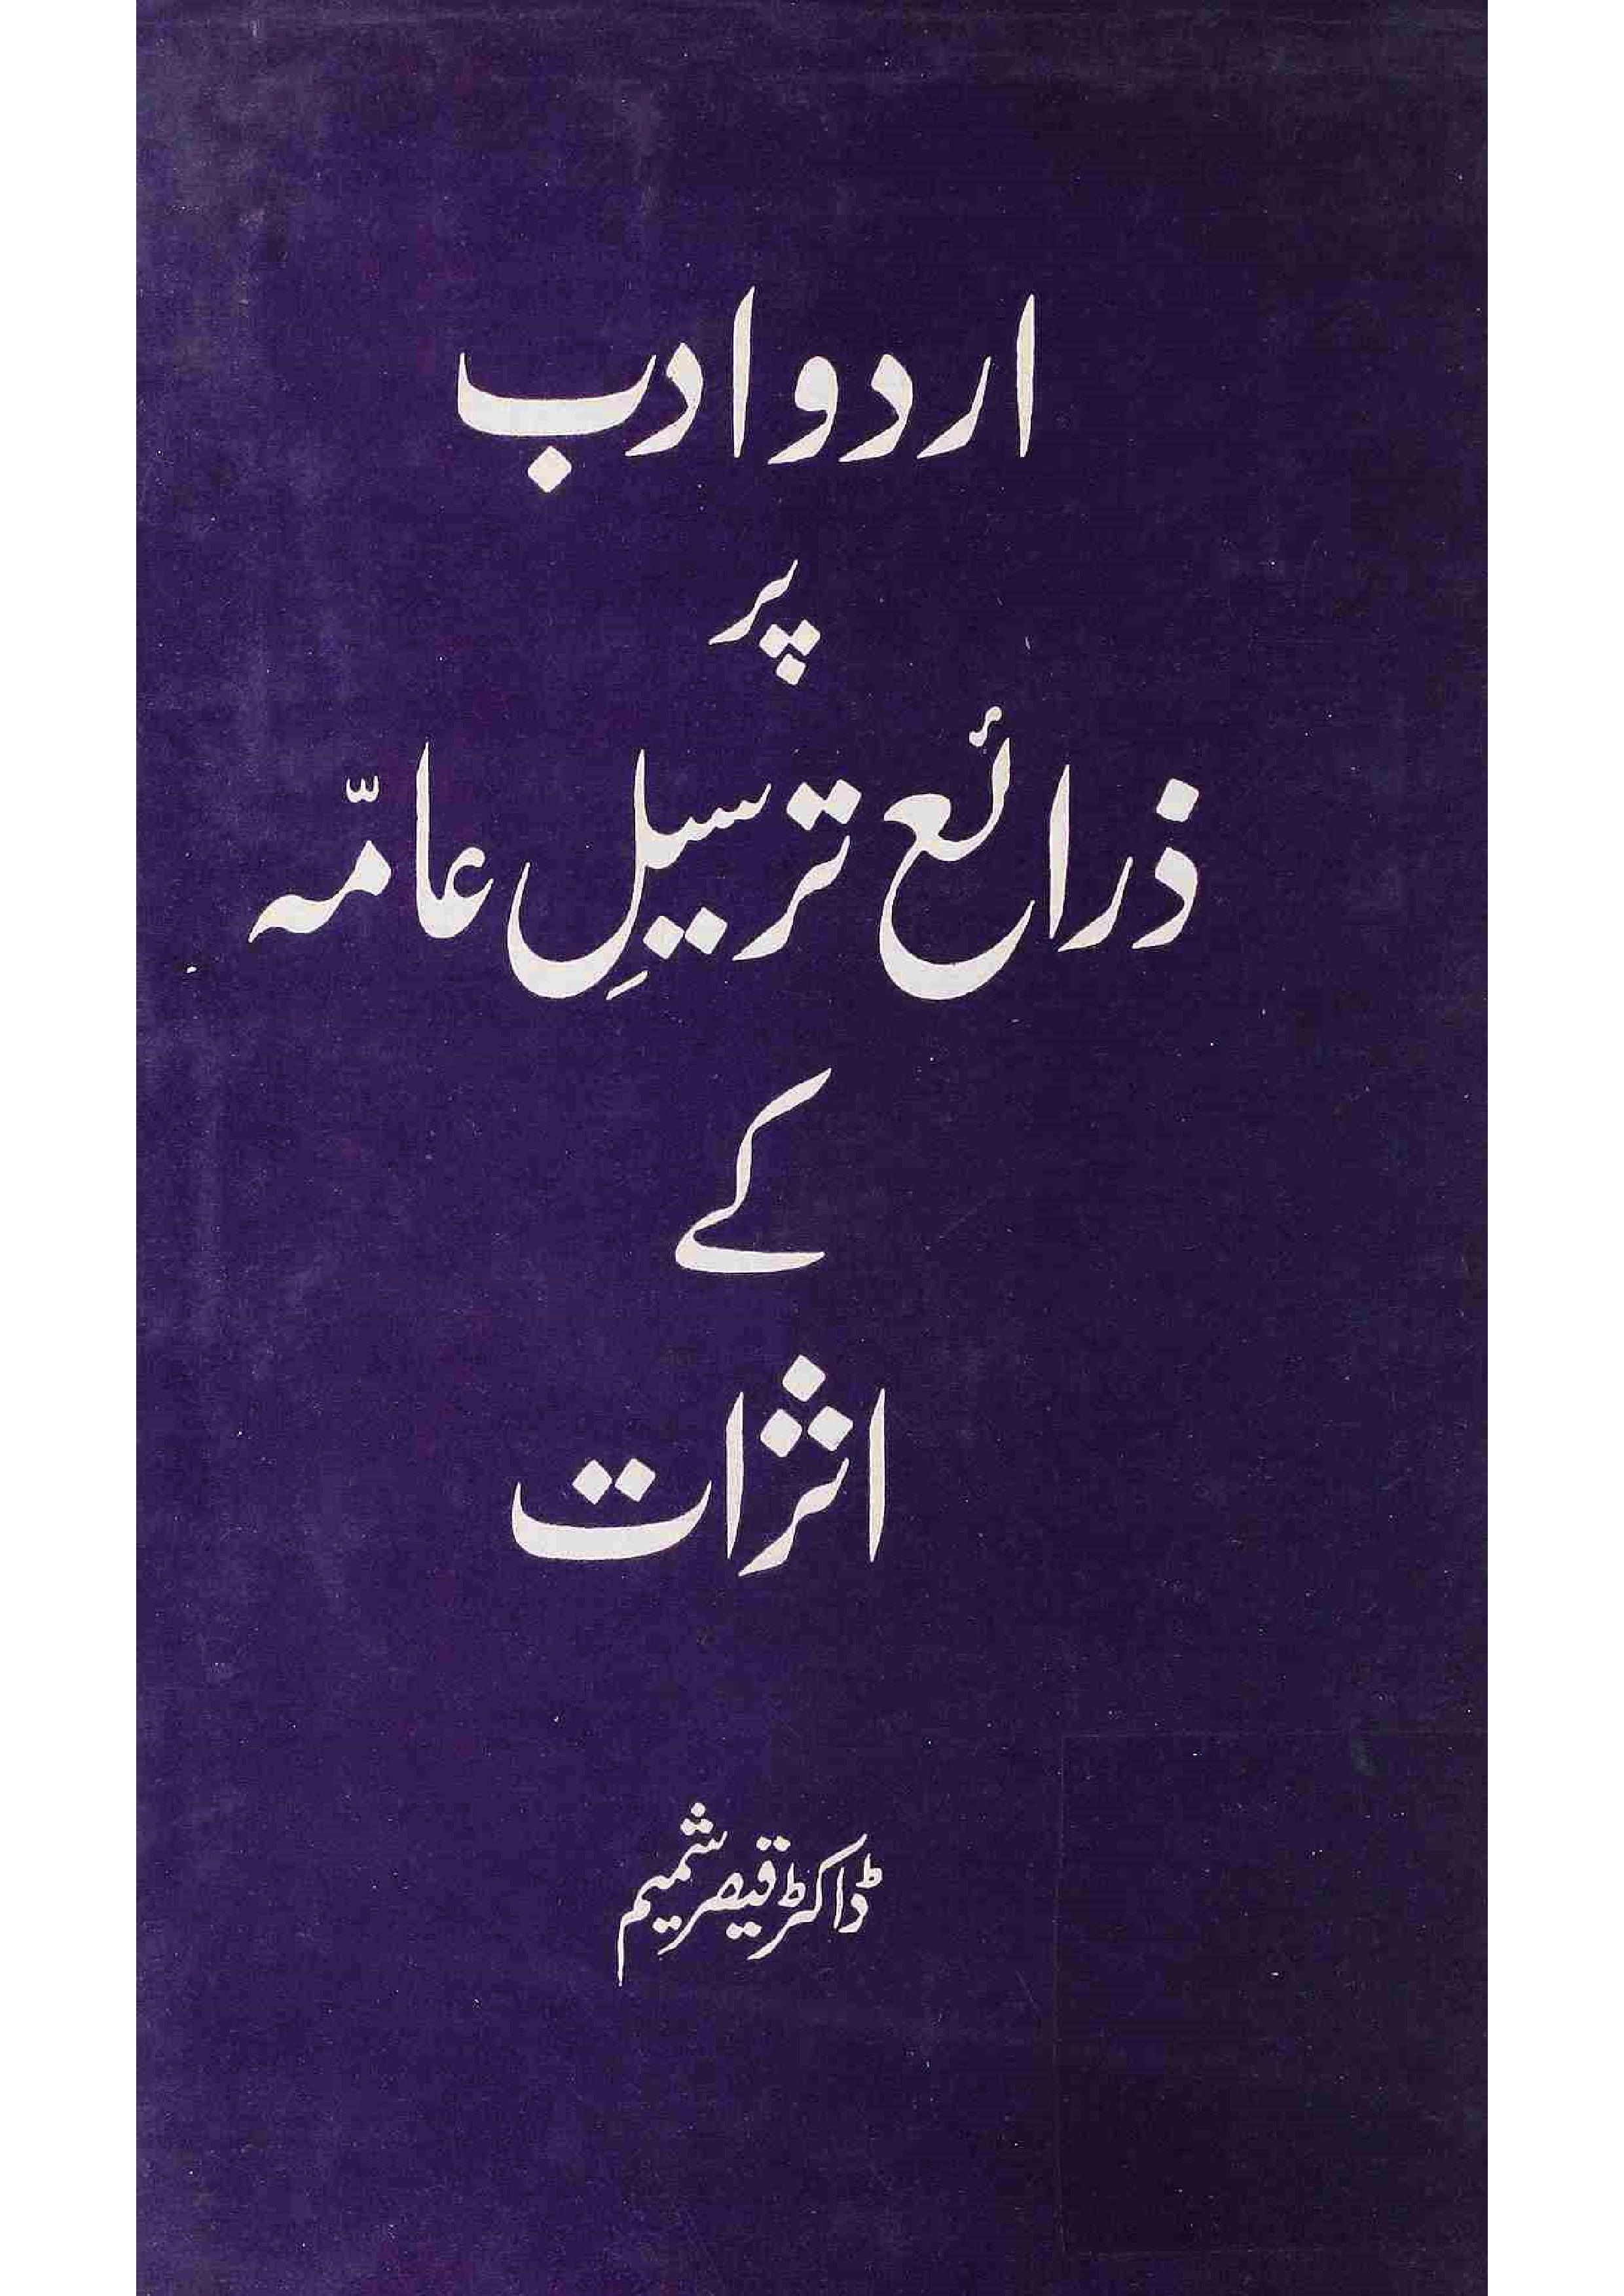 Urdu Adab Par Zarae Tarseel-e-Aamma Ke Asraat